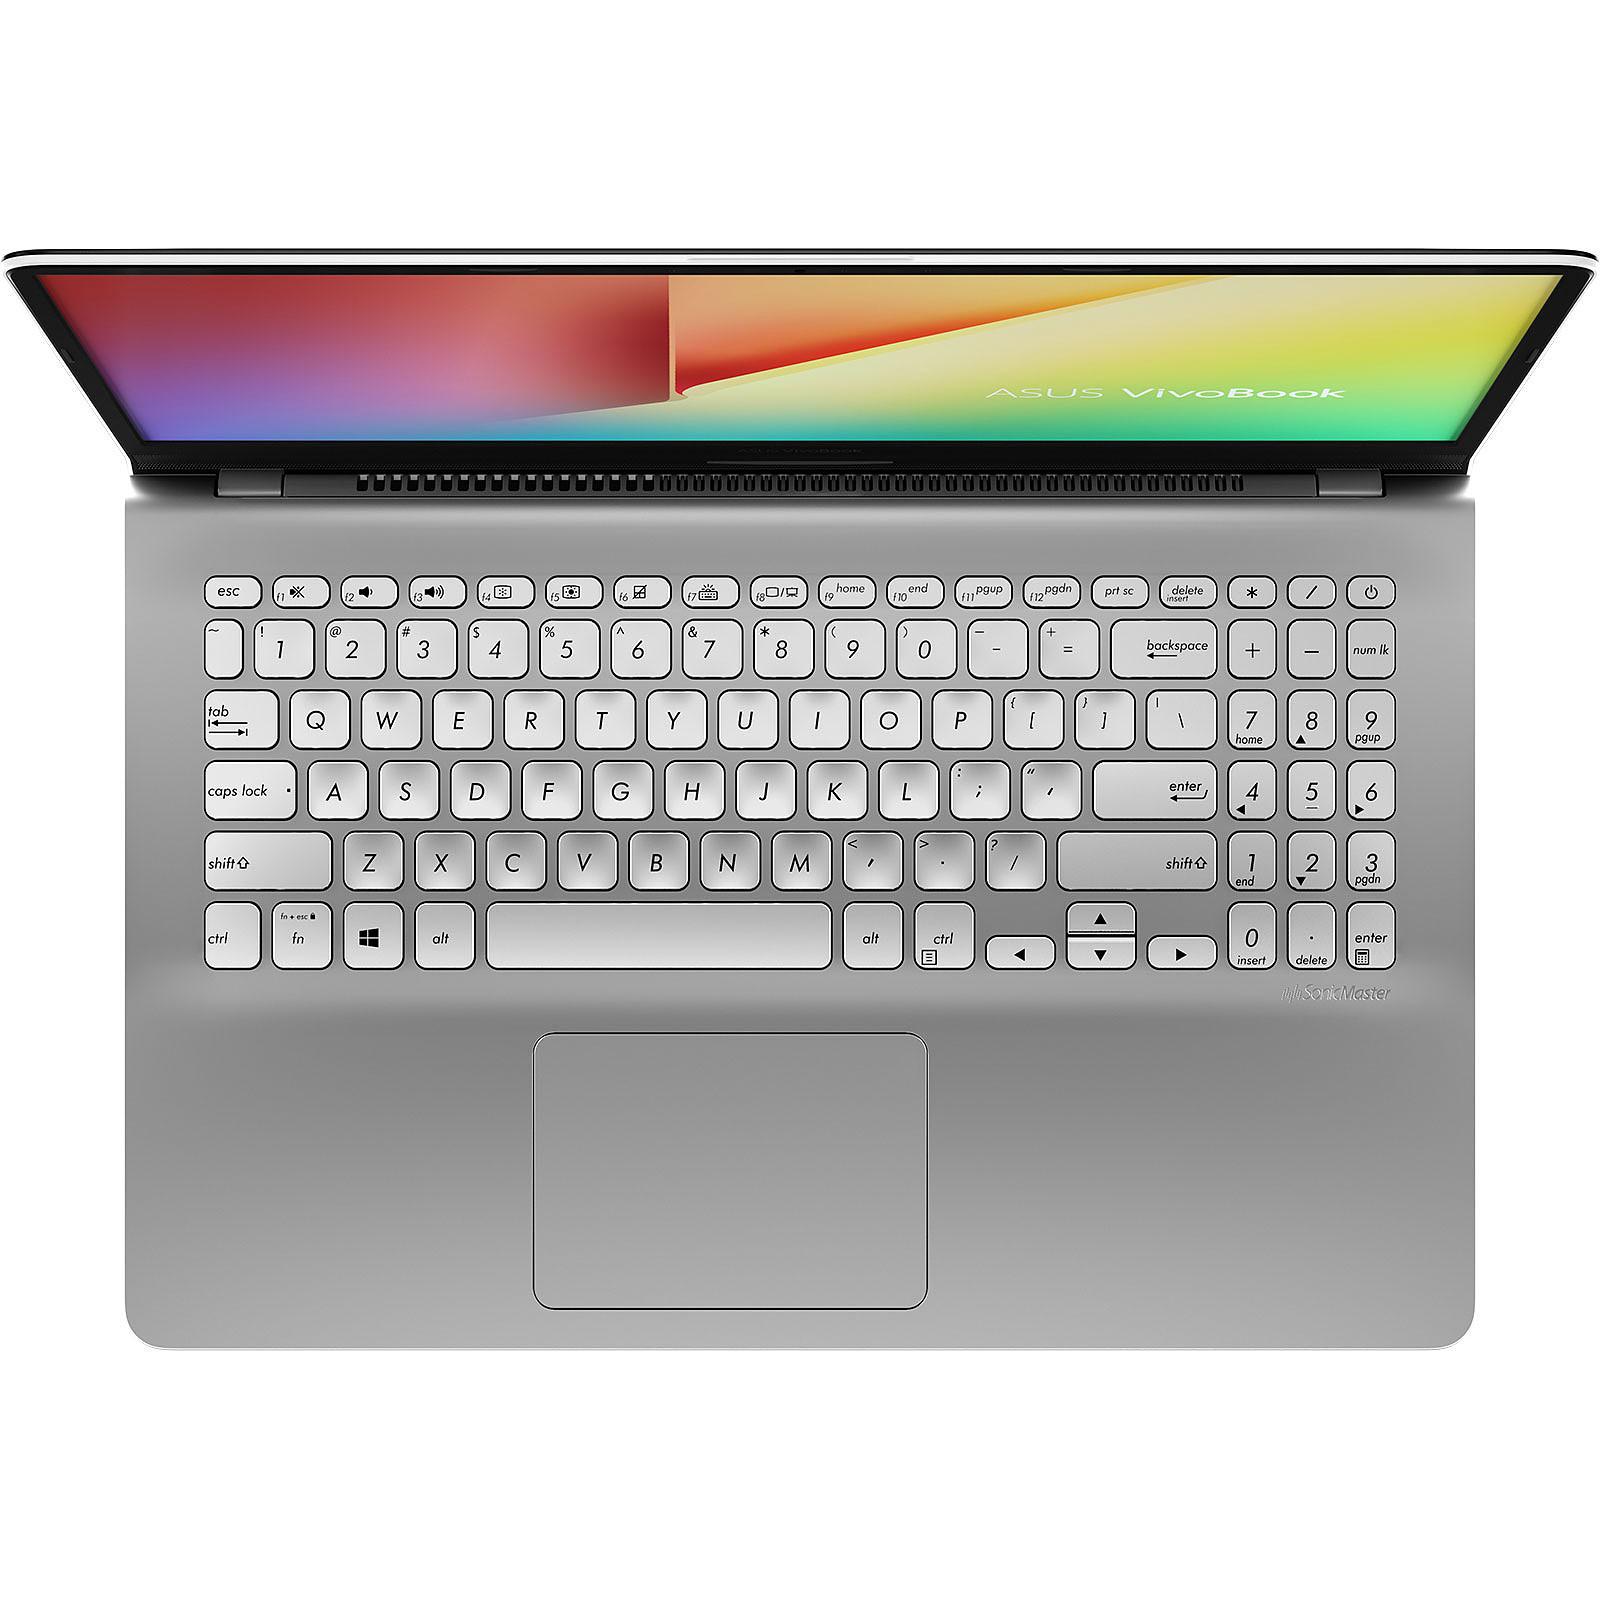 cd3e5fd43e ASUS Vivobook S15 S530FA-BQ270T - PC portable ASUS sur LDLC.com